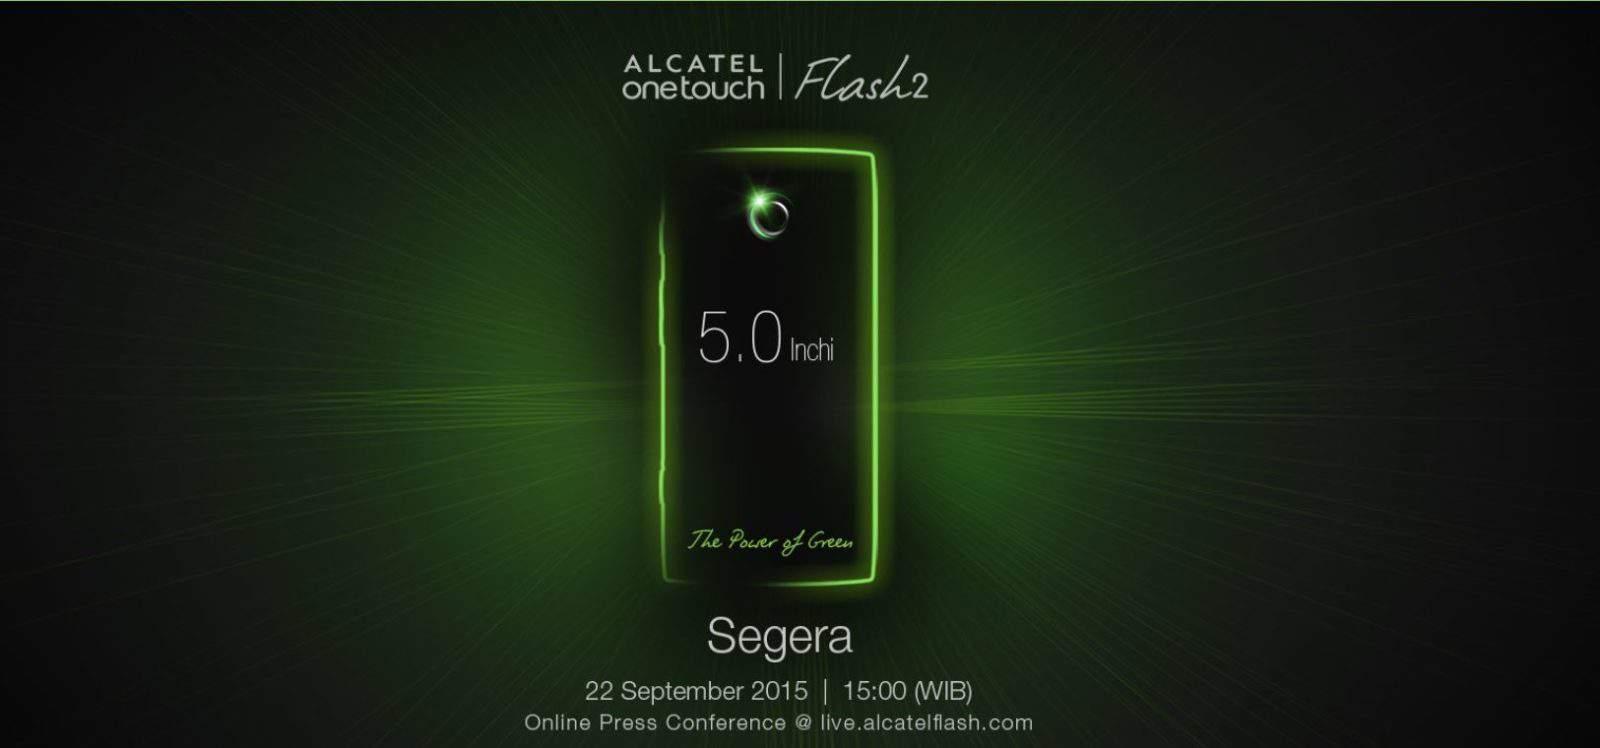 Alcatel Flash 2 Teaser